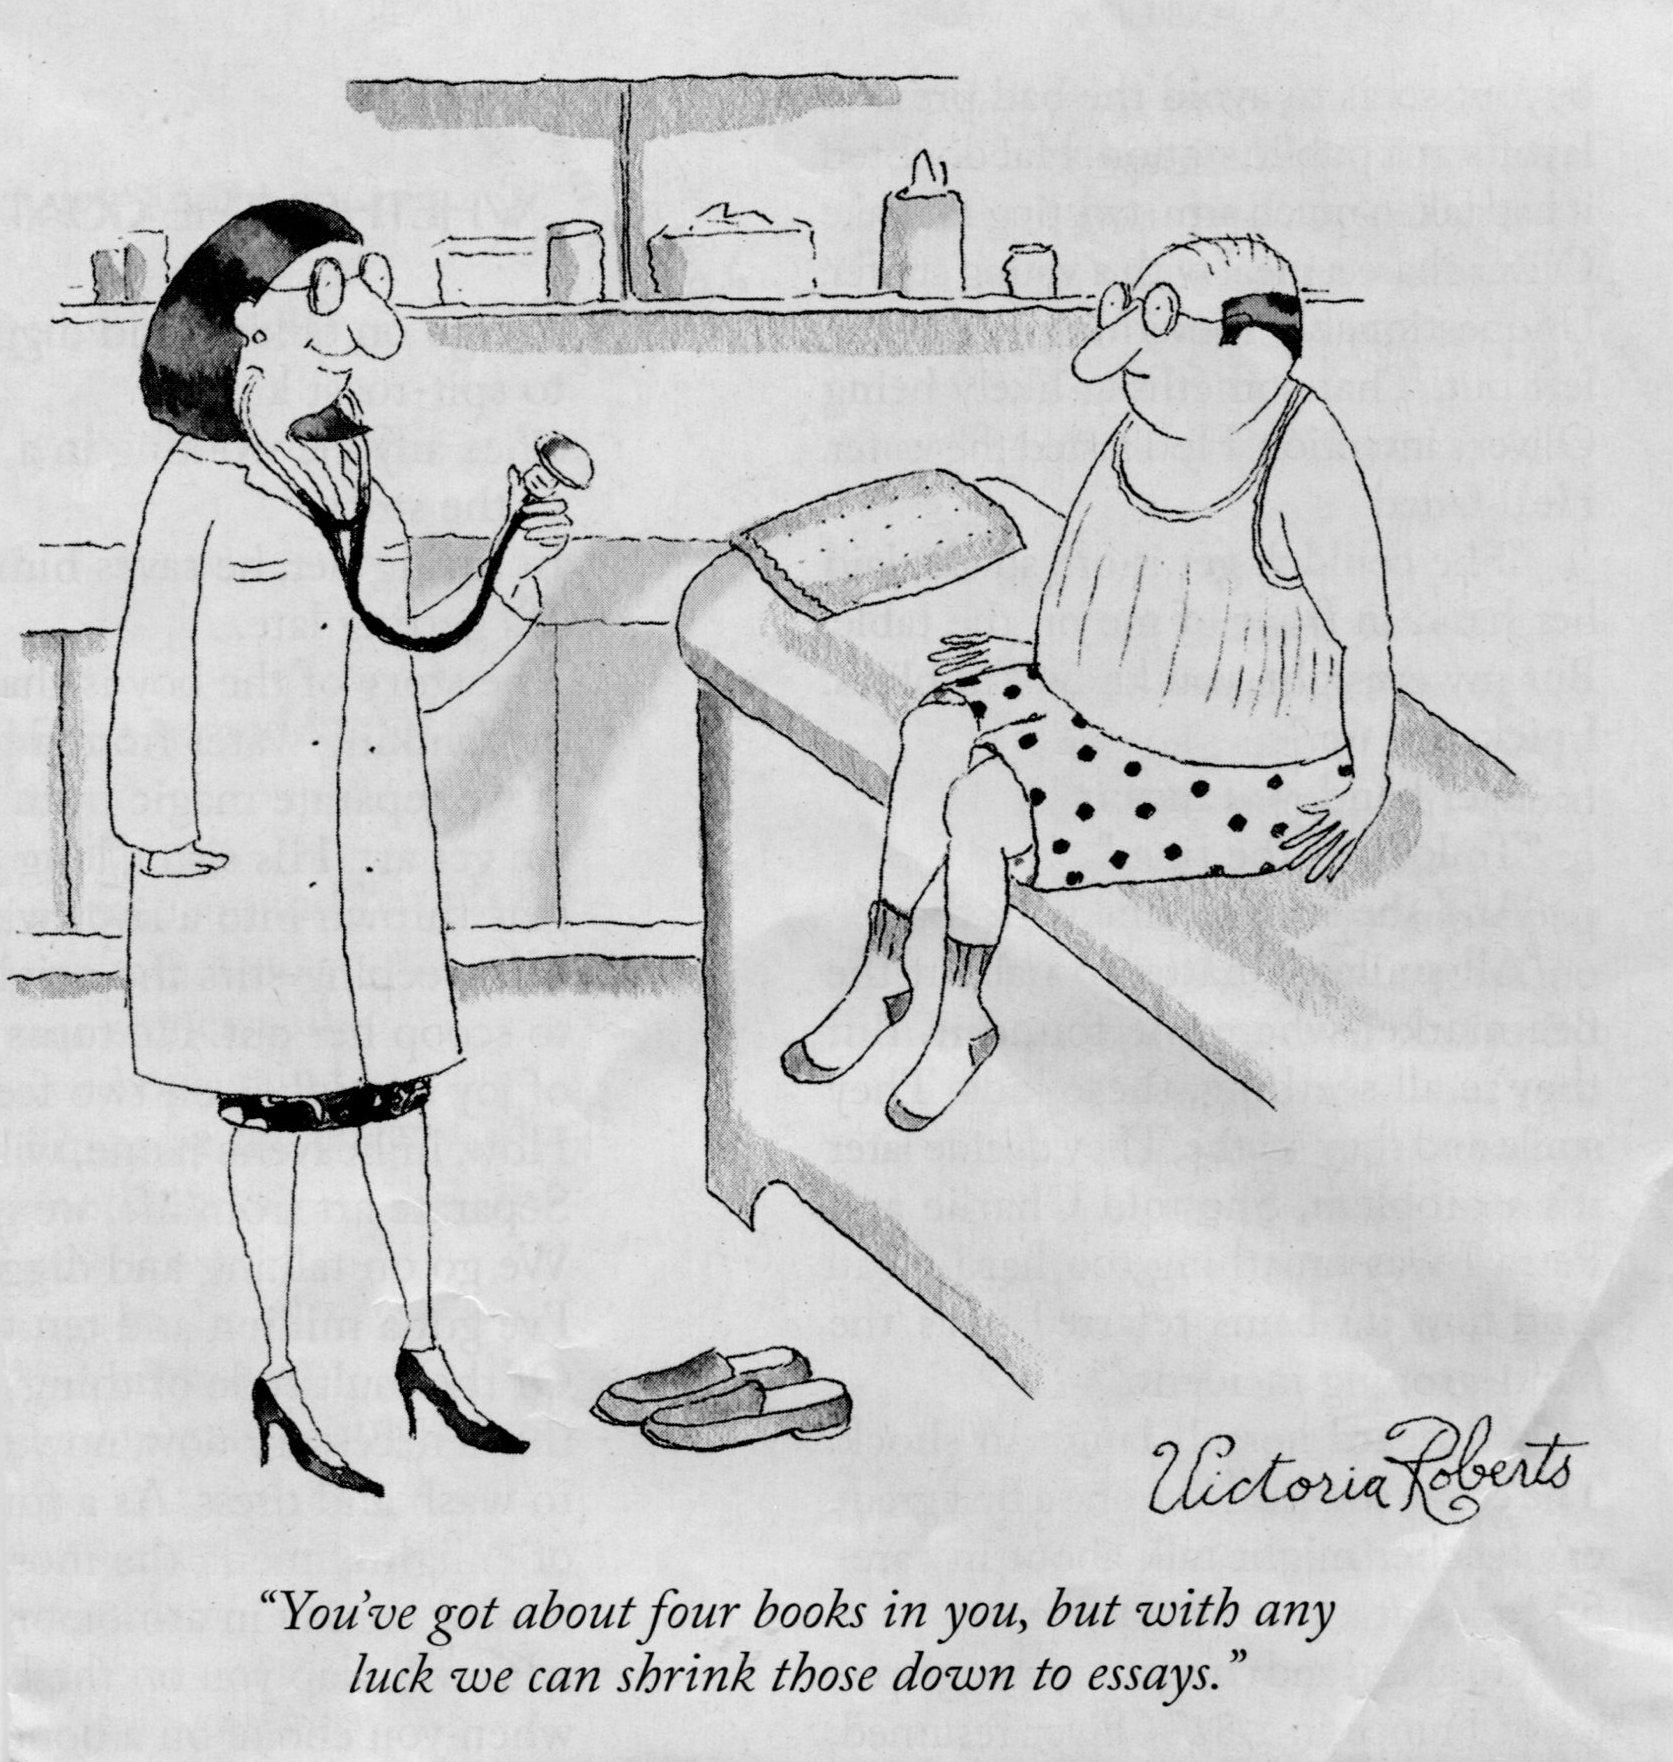 New Yorker cartoon, books & essays.jpg